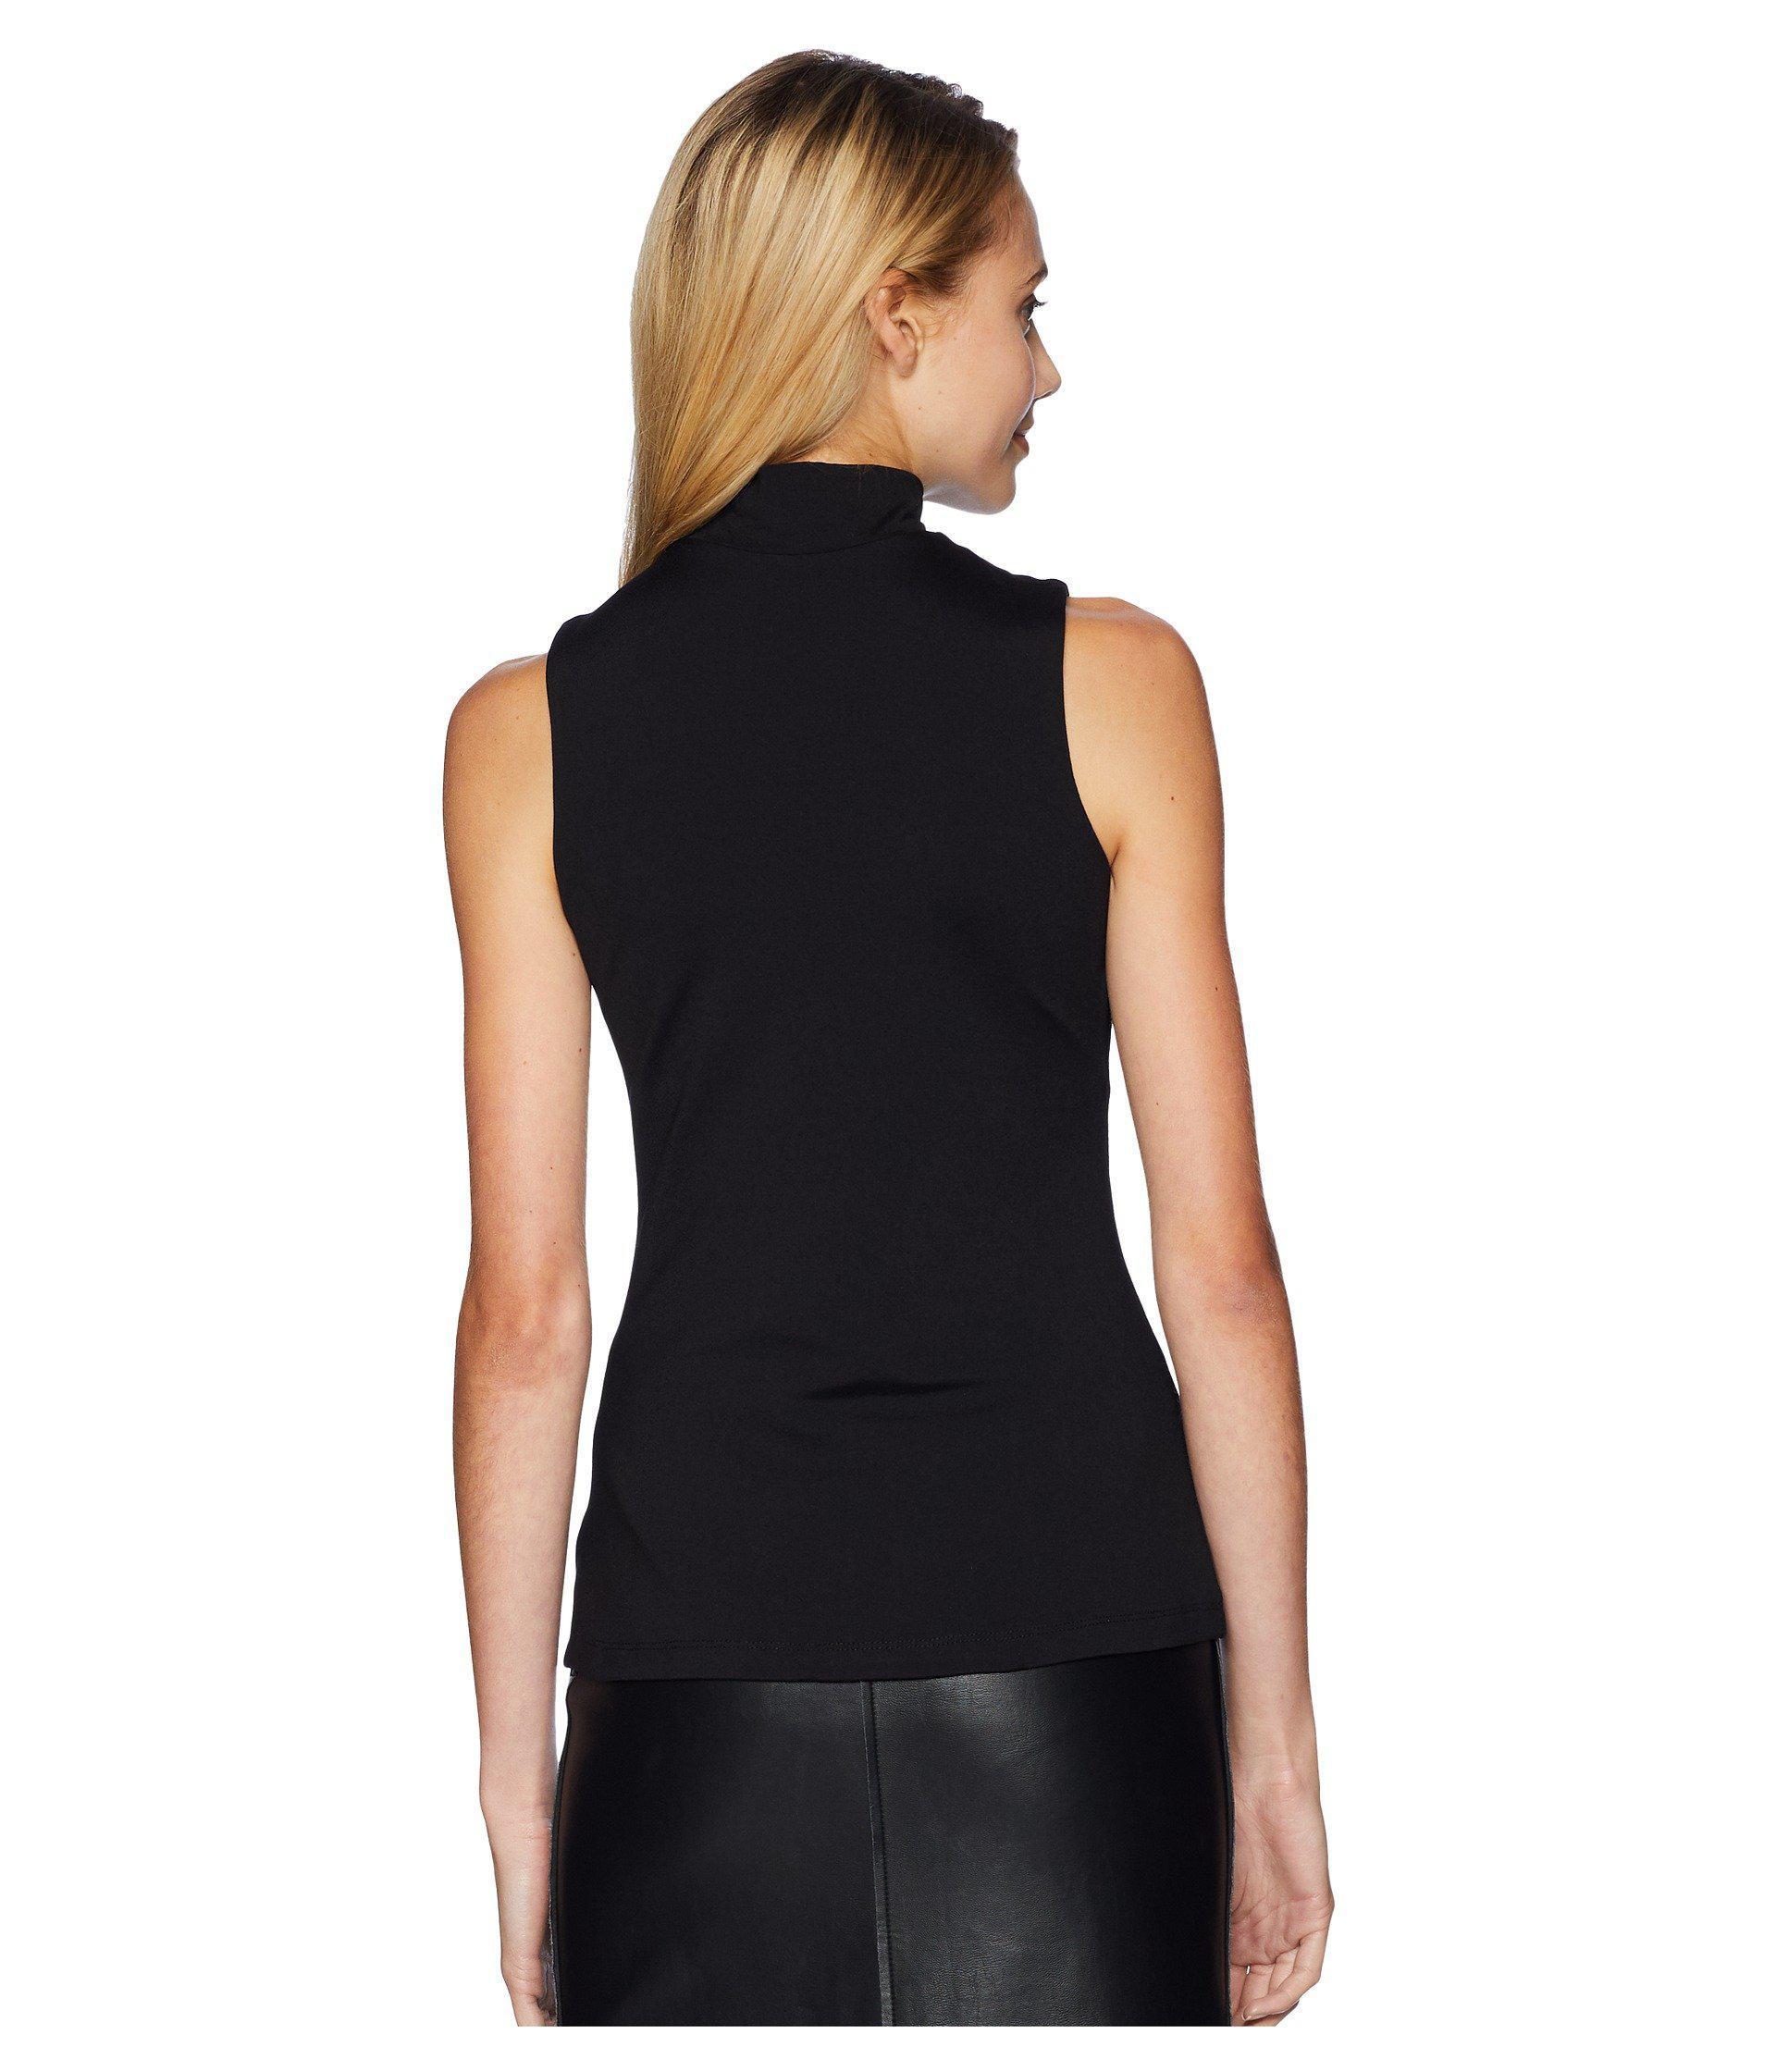 5f25db14444de Susana Monaco - High Neck Sleeveless Top (black) Women s Sleeveless - Lyst.  View fullscreen